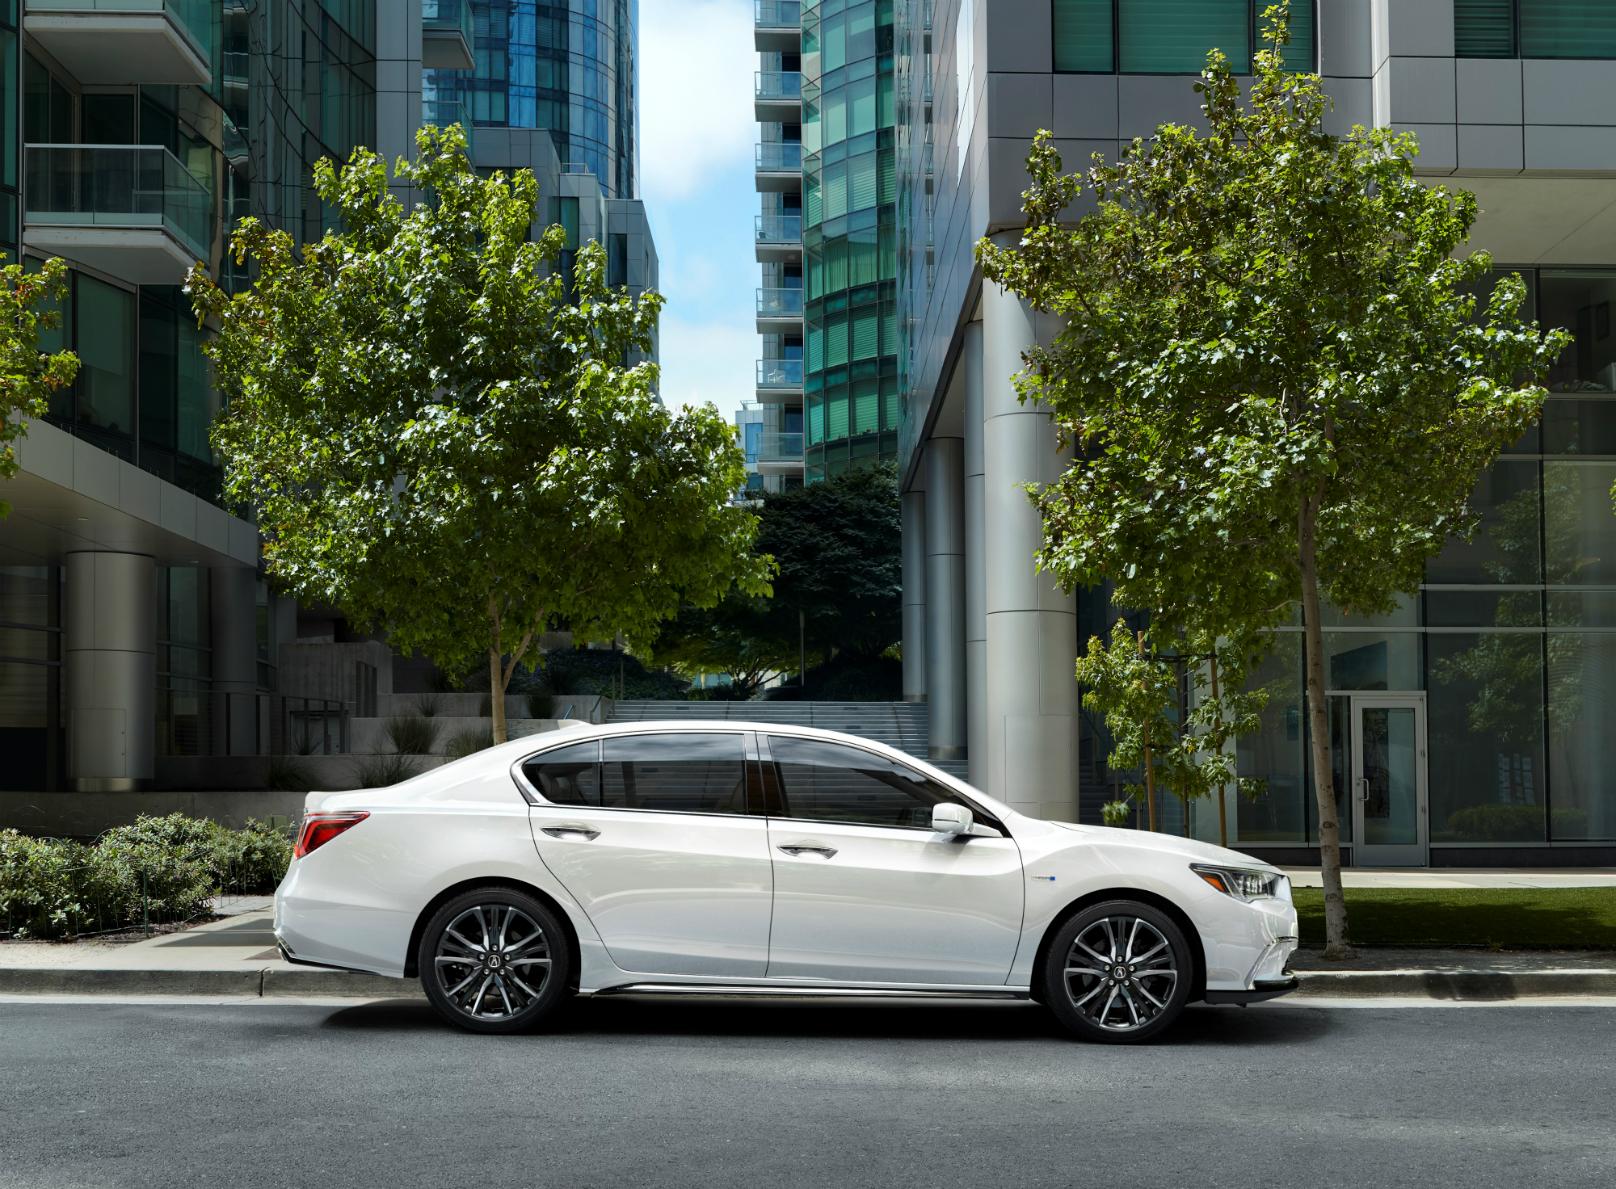 2018 Acura RLX Sport Hybrid SH-AWD